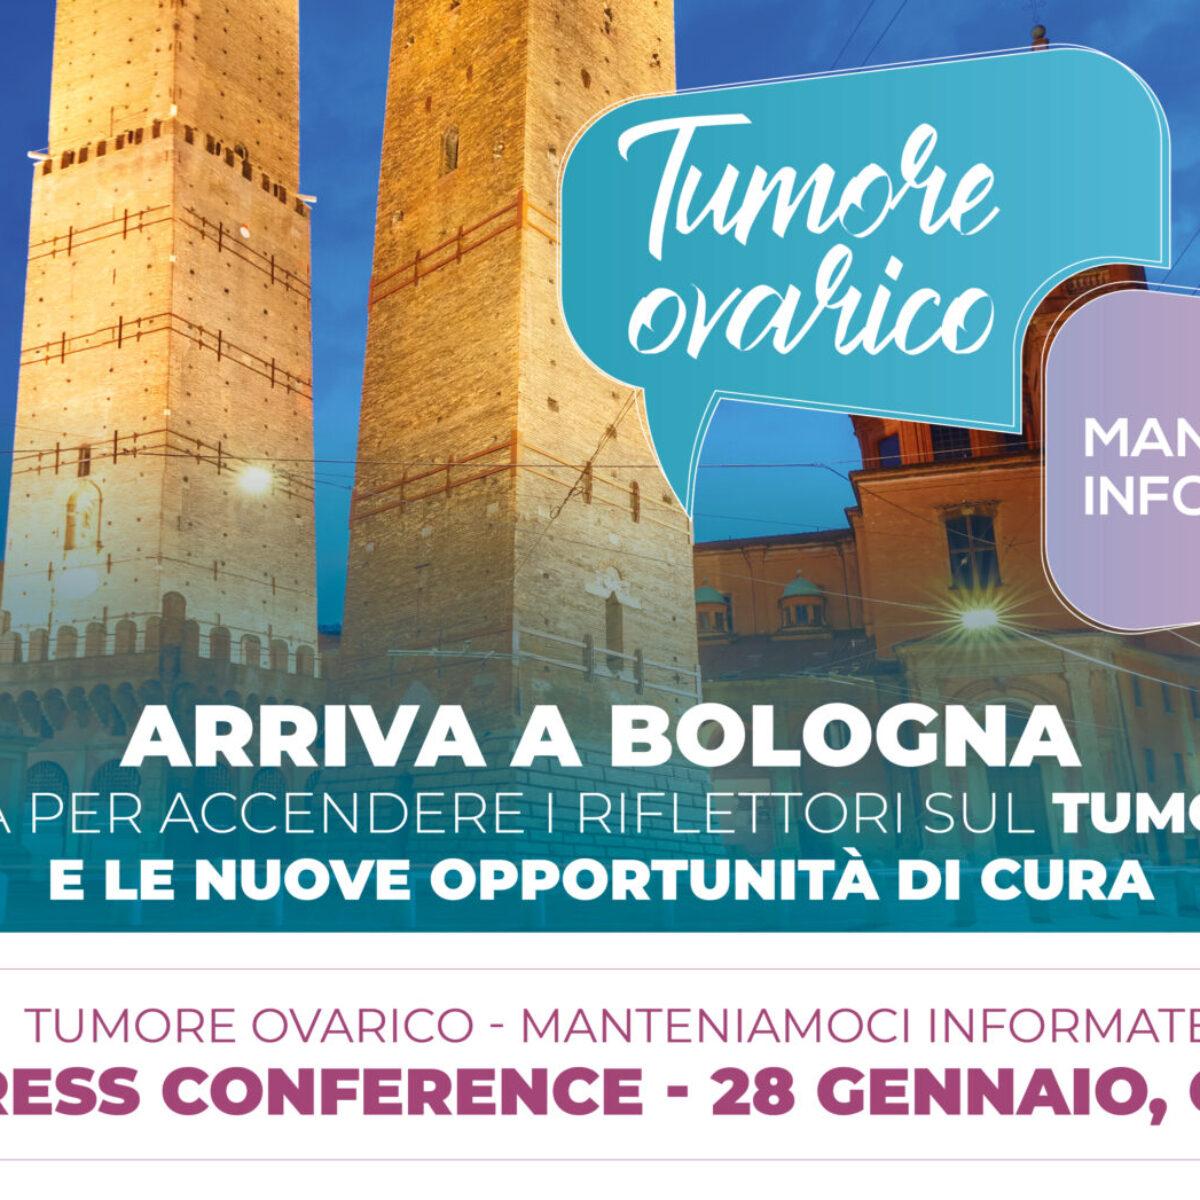 imm_Facebook_Bologna